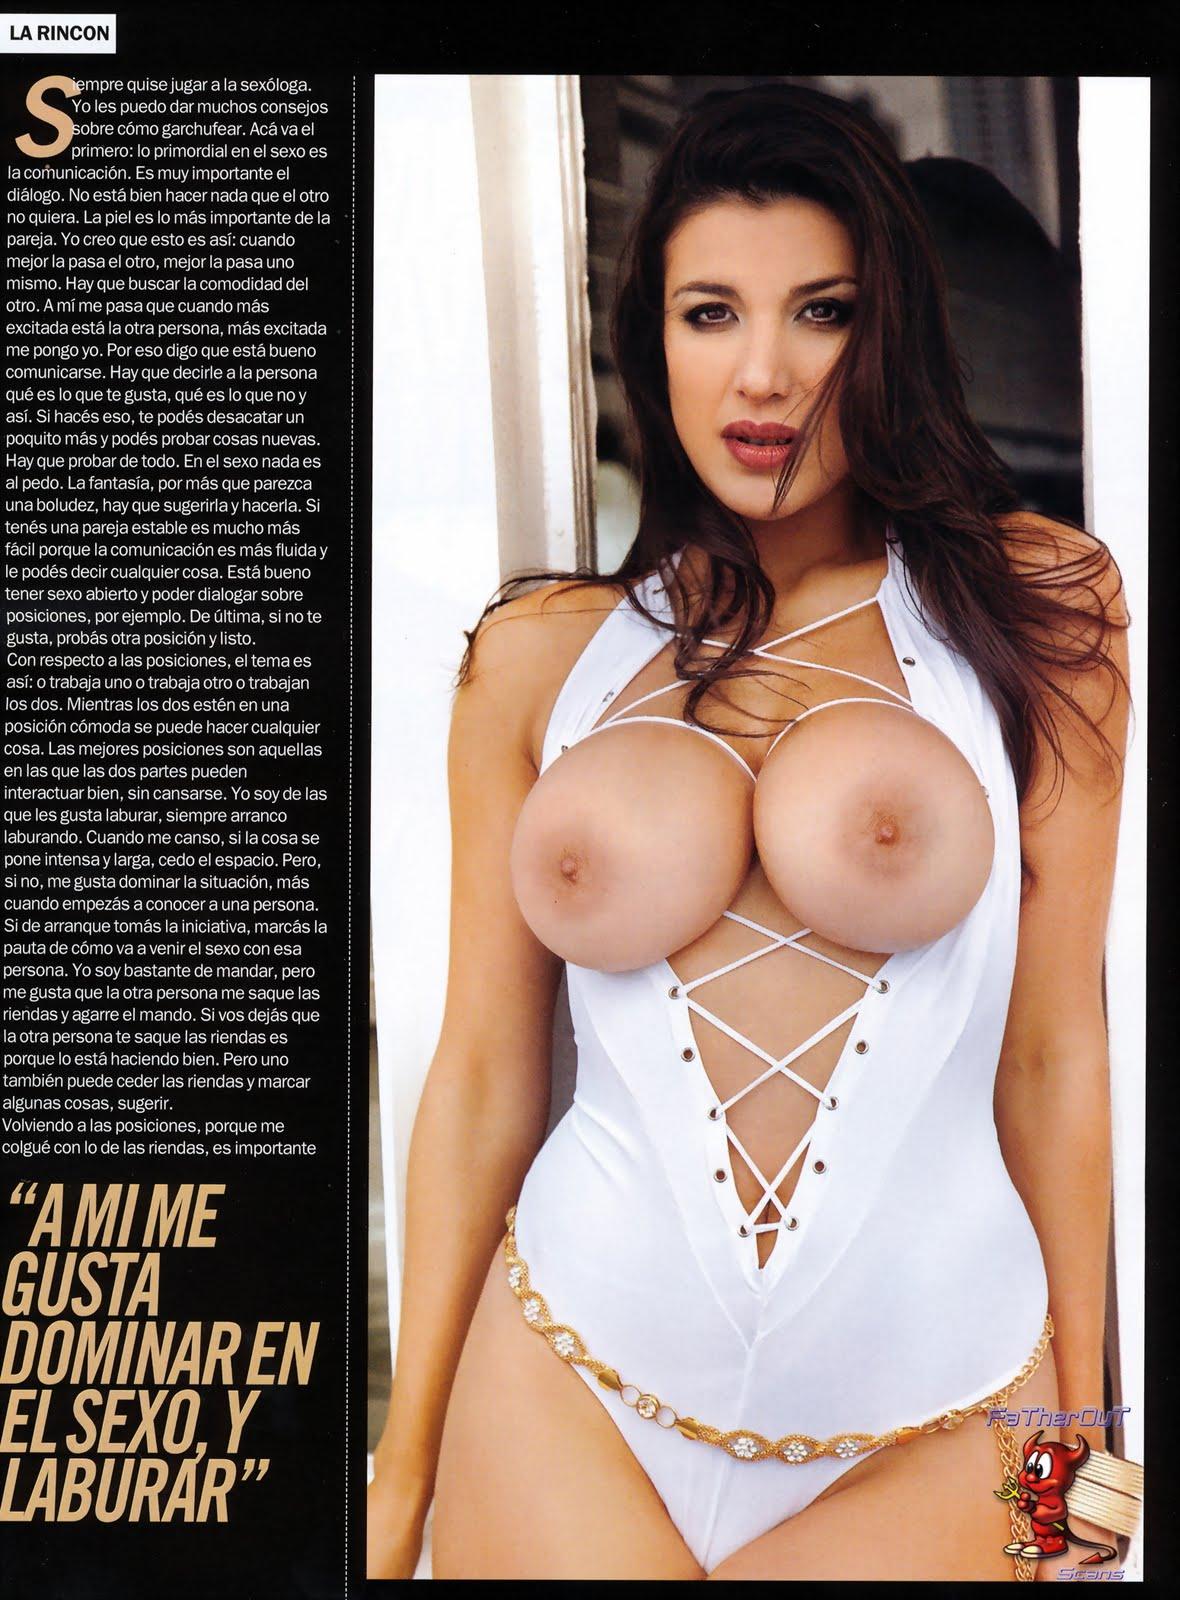 Andrea Rincón Naked download sex pics andrea rincon fotos | nude picture hd